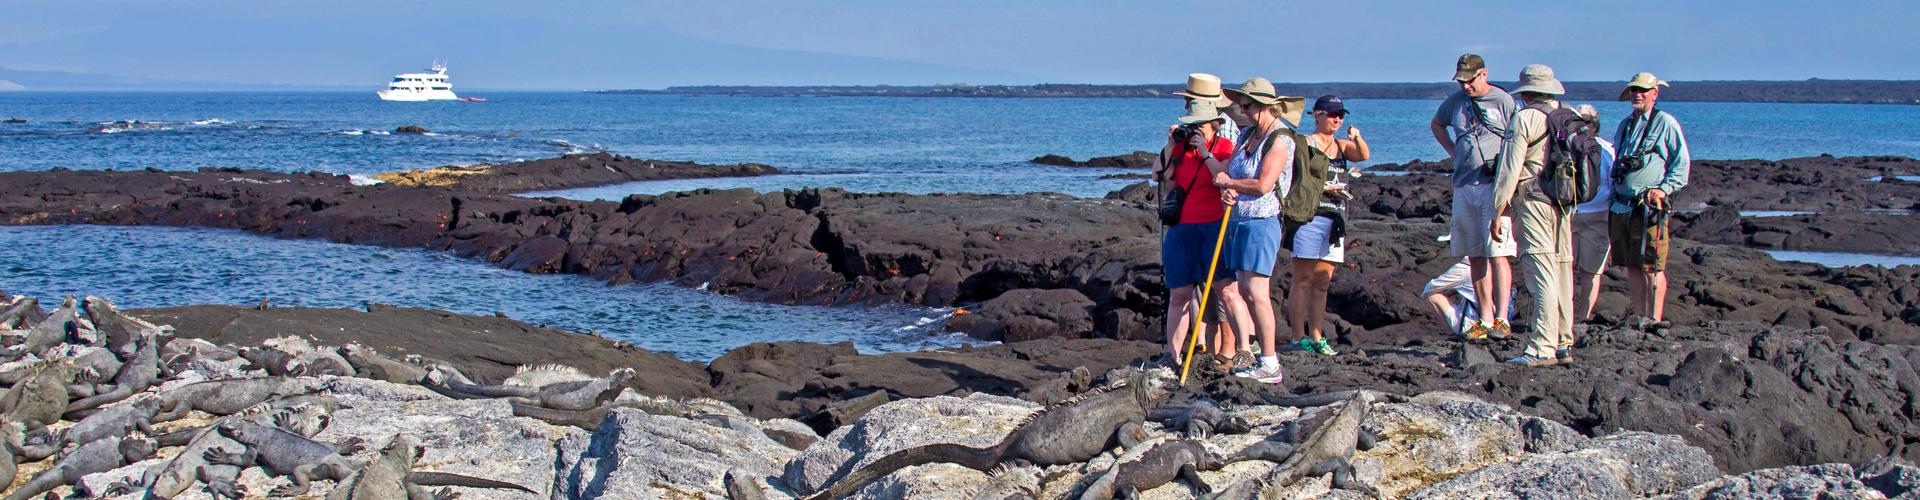 Galapagos at a Glance: Southern Islands (Daphne)